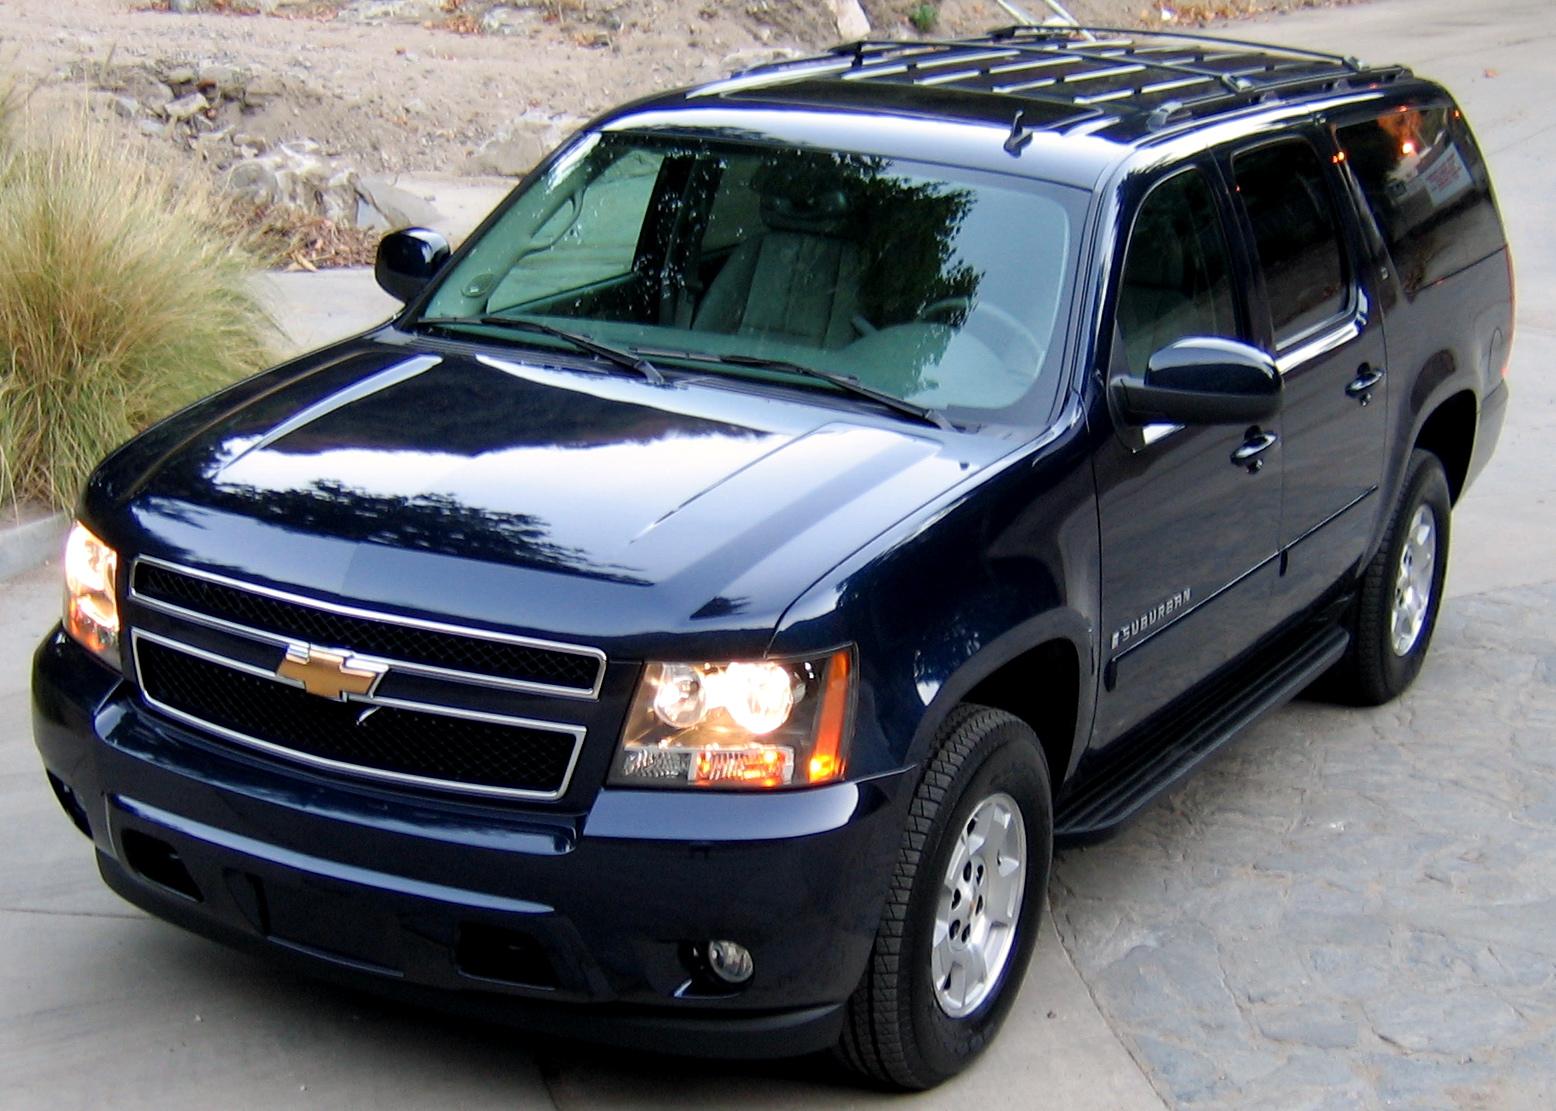 Chevrolet Suburban 2008 foto - 3